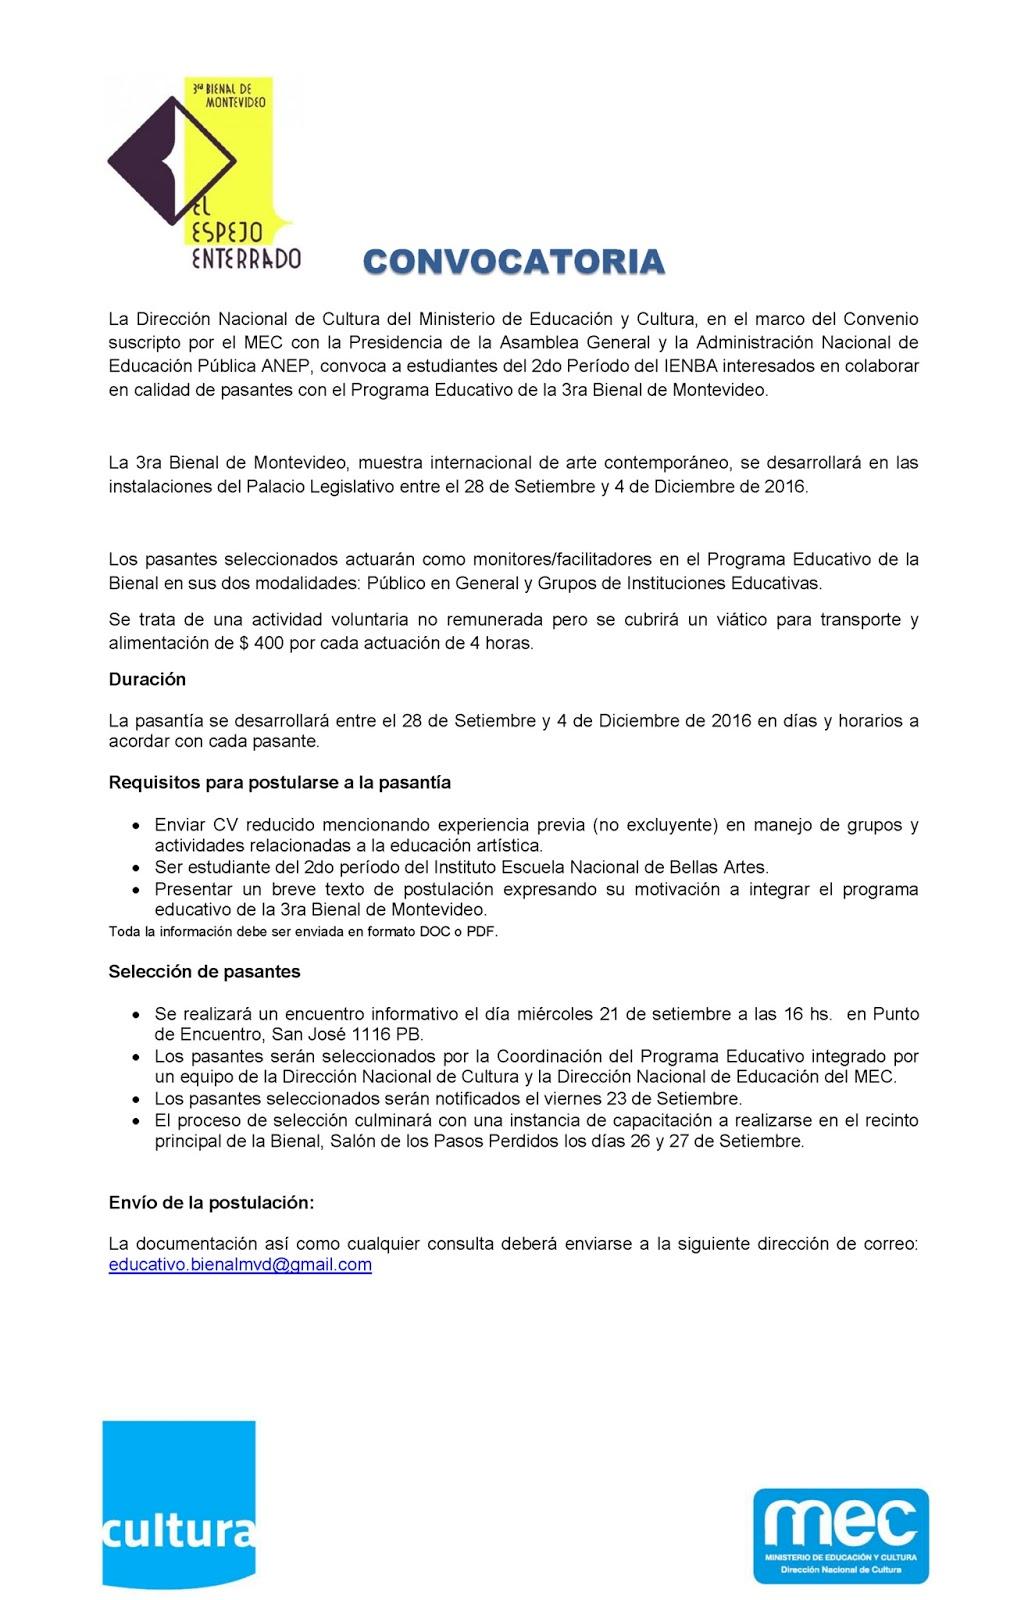 Urm convocatoria pasantes con el programa educativo de la for Convocatoria docentes exterior